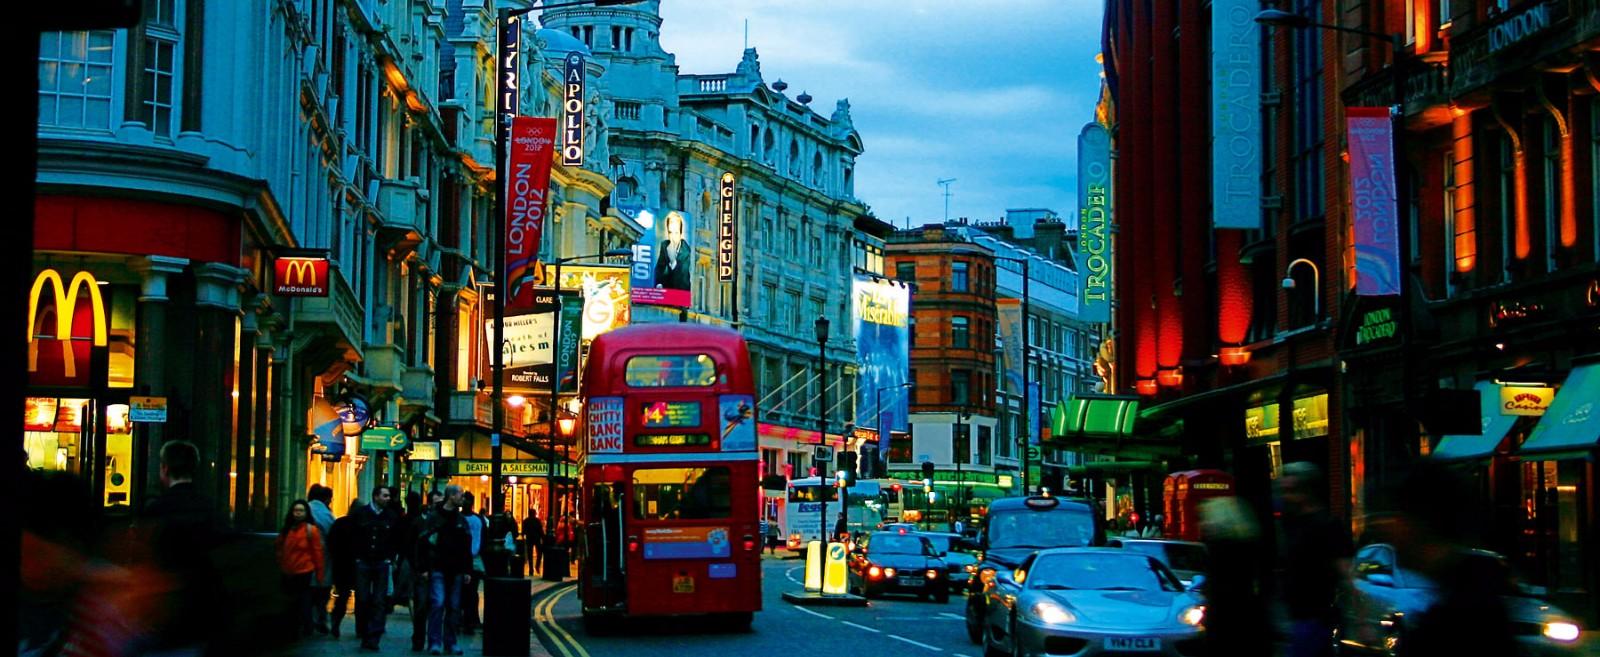 PHOTO LONDON 大伦敦主题摄影展